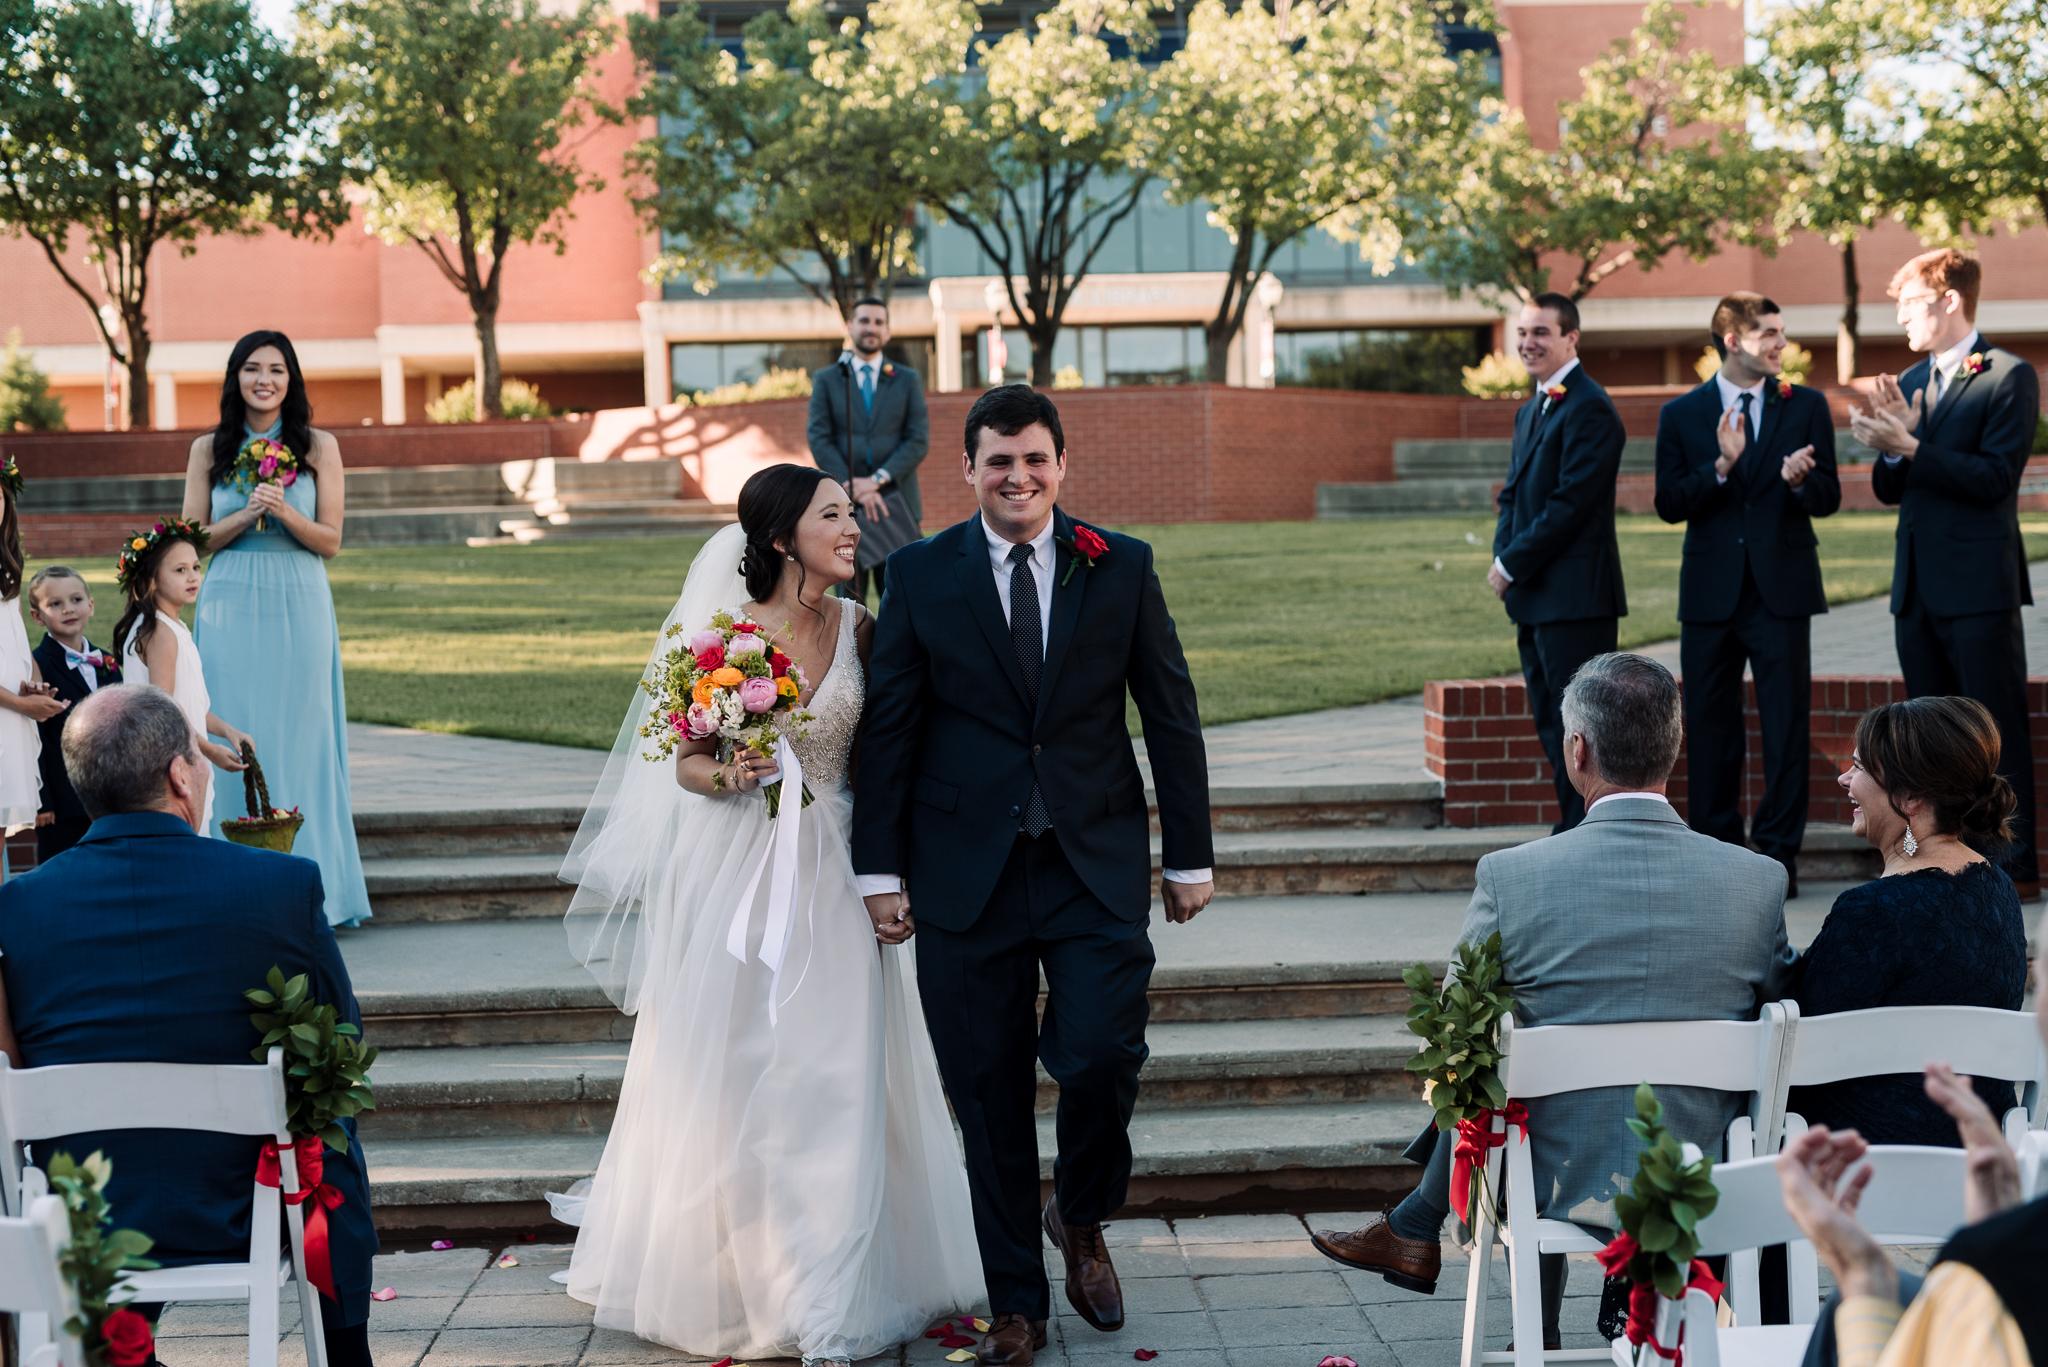 Oklahoma-Christian-University-Wedding-8287.jpg